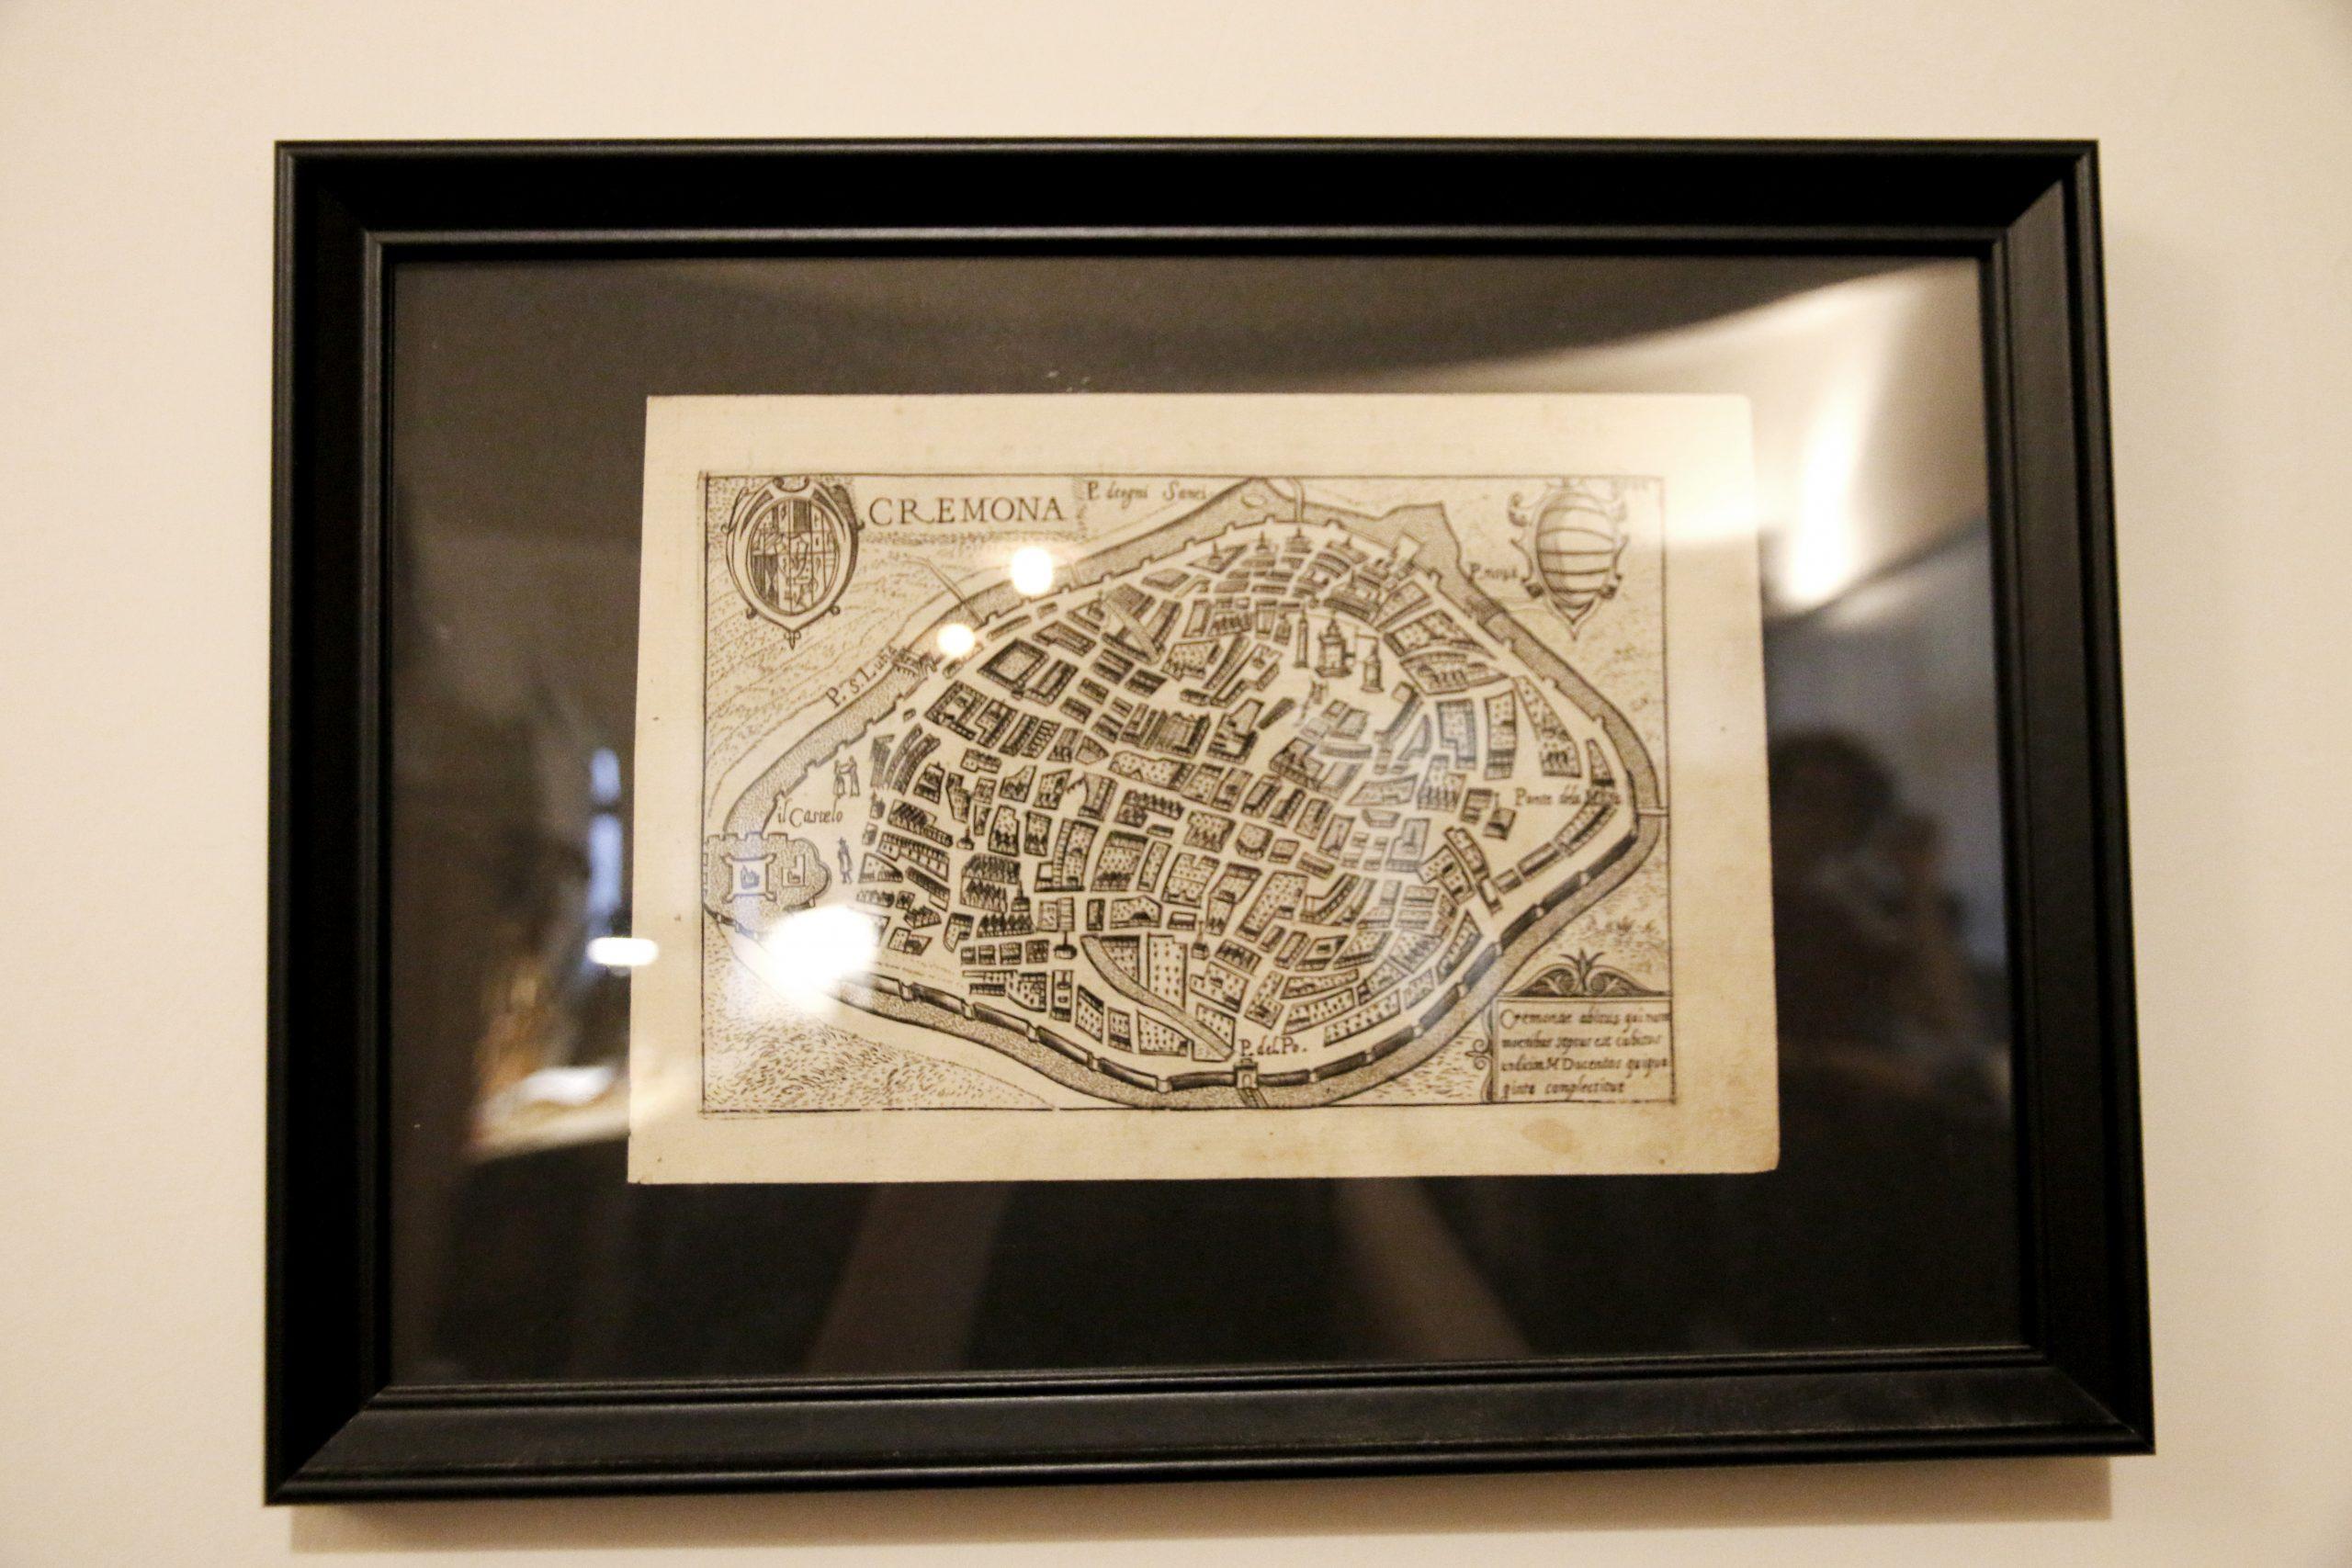 cremona地圖 意大利 小提琴之都